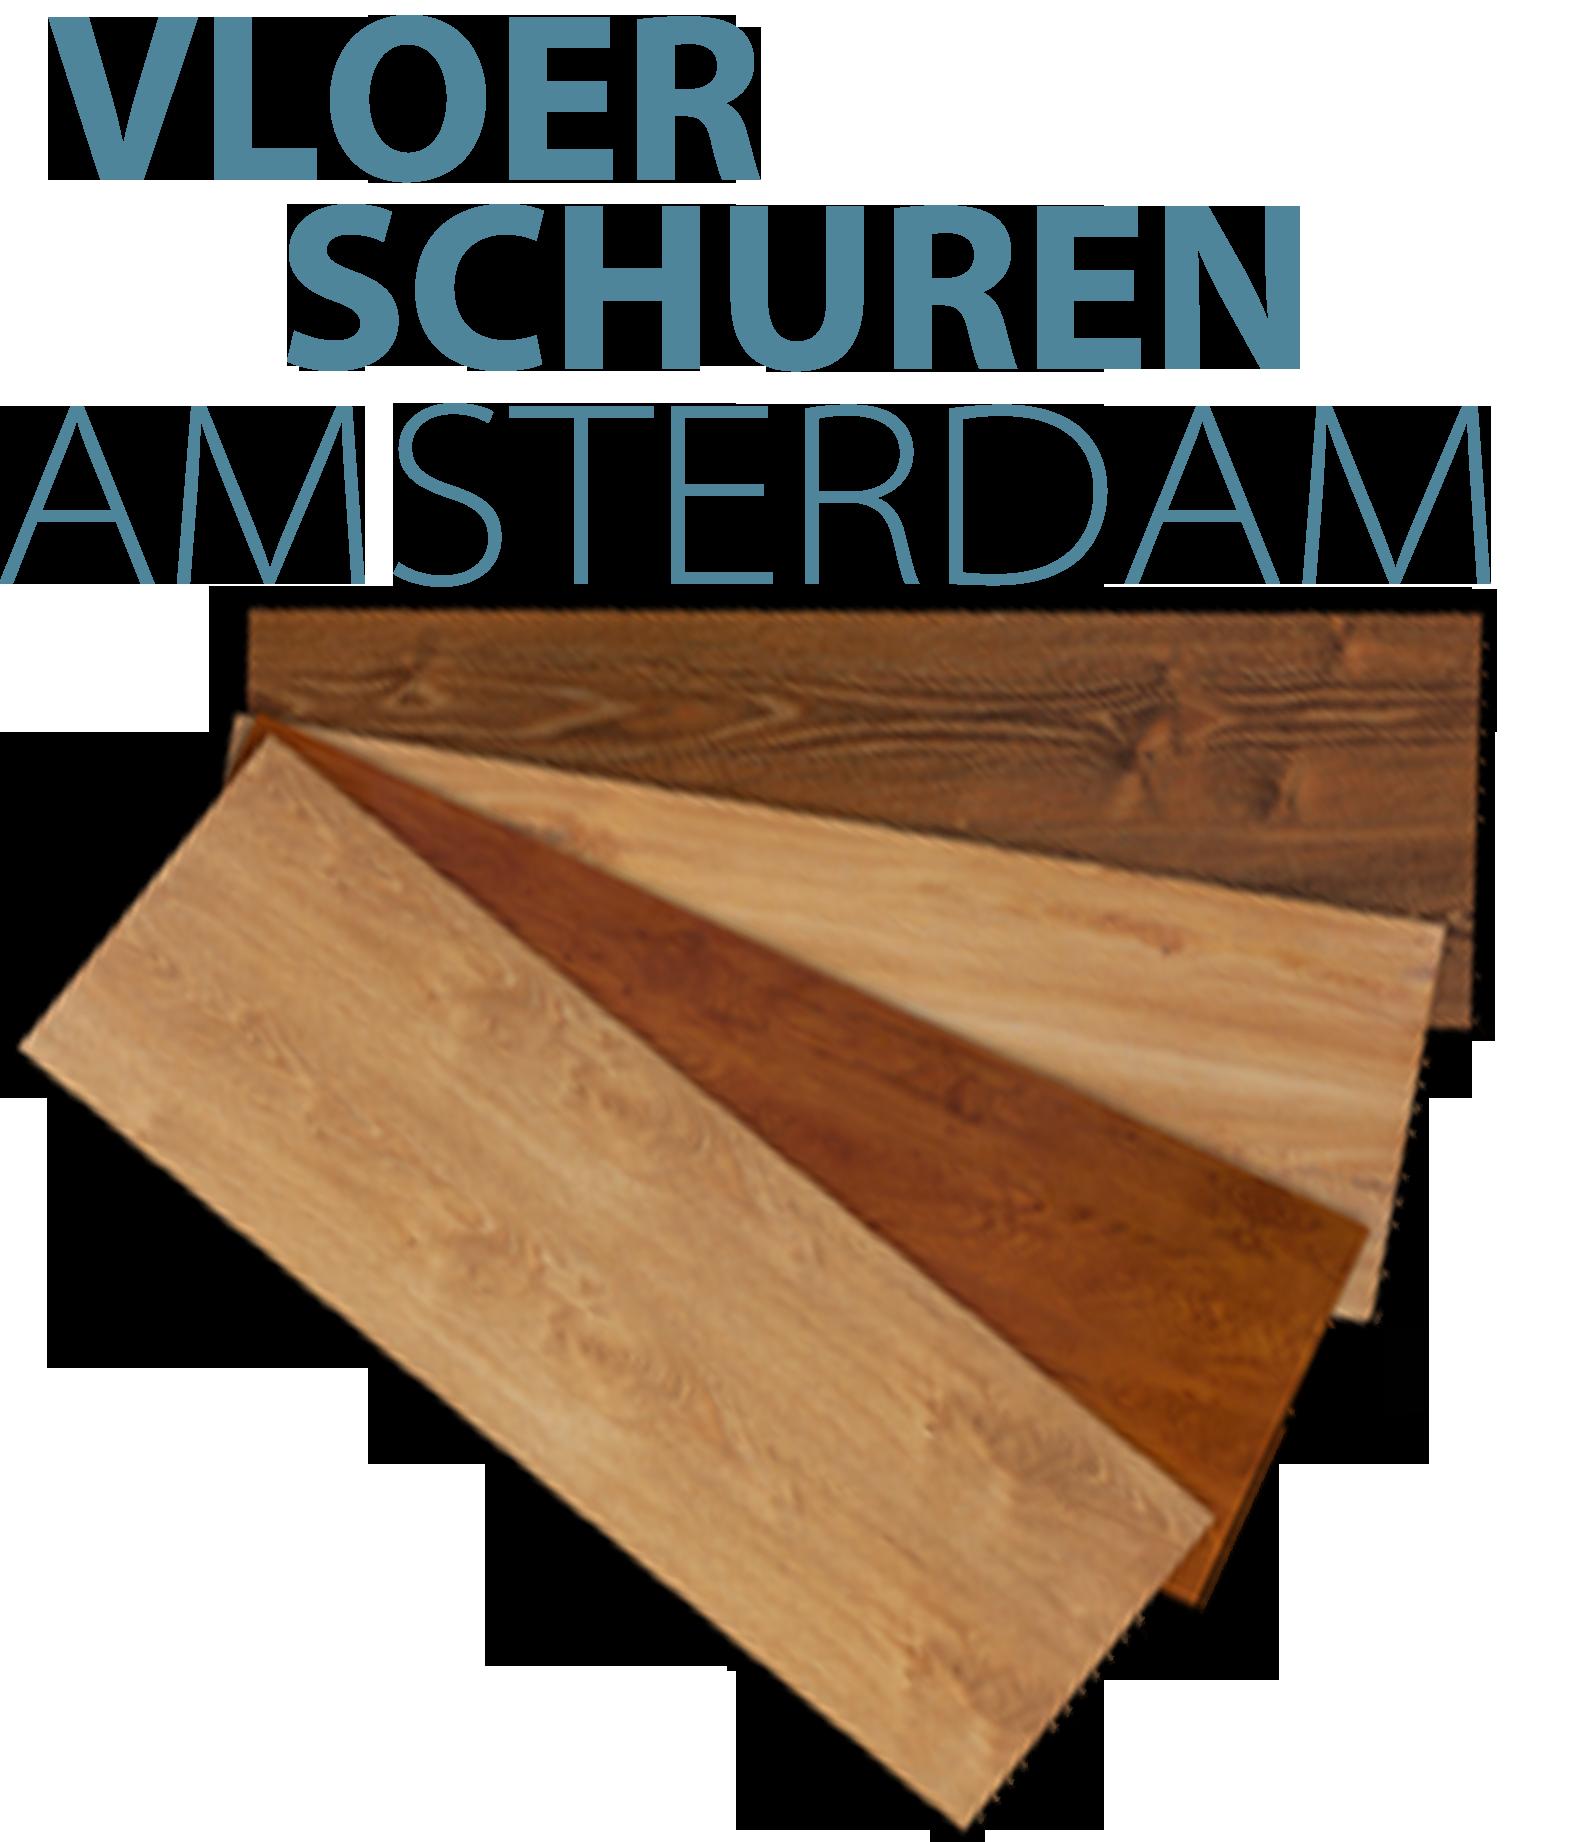 Vloer schuren Amsterdam